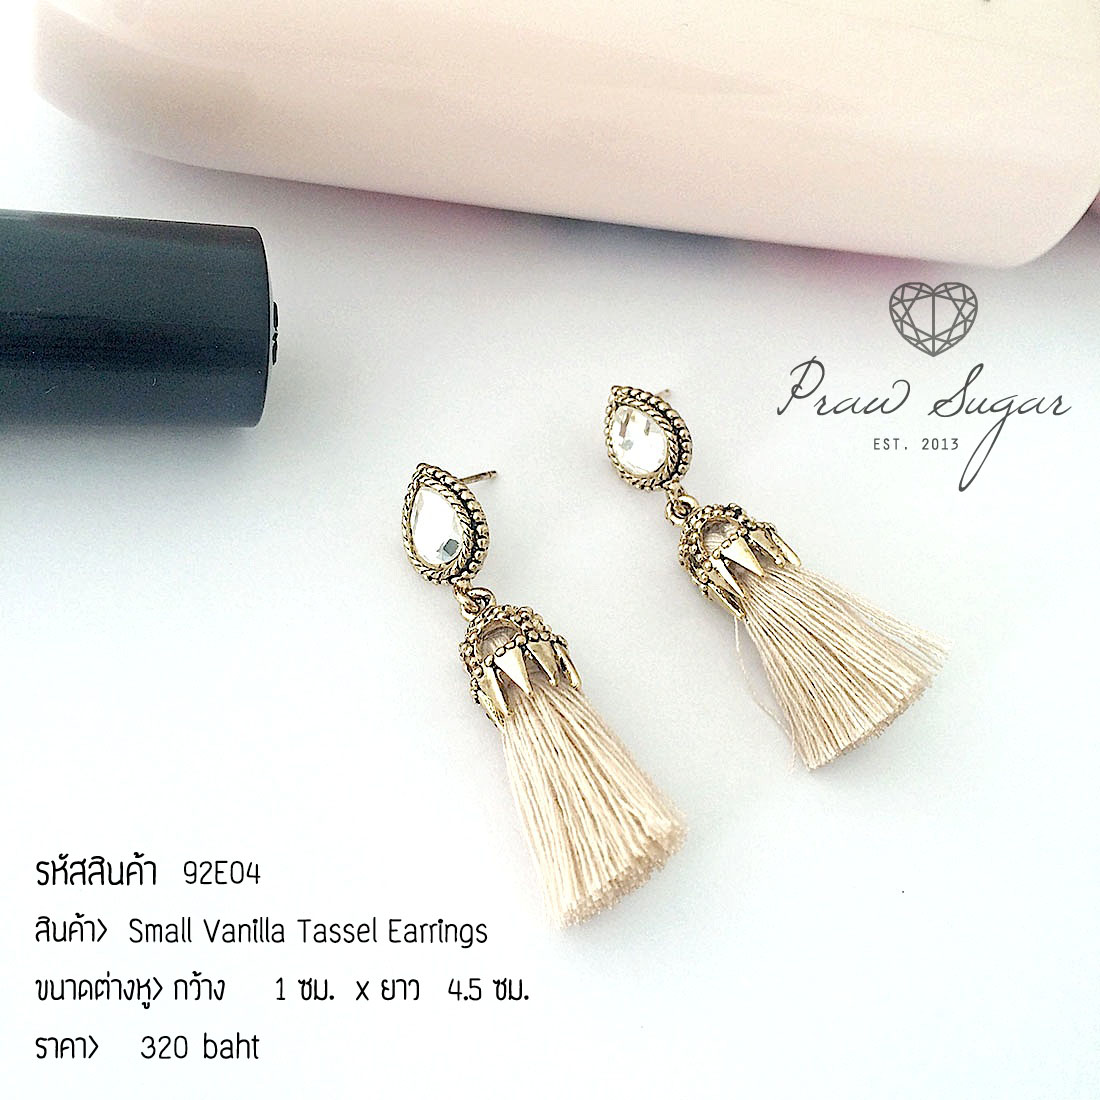 Small Vanilla Tassel Earrings